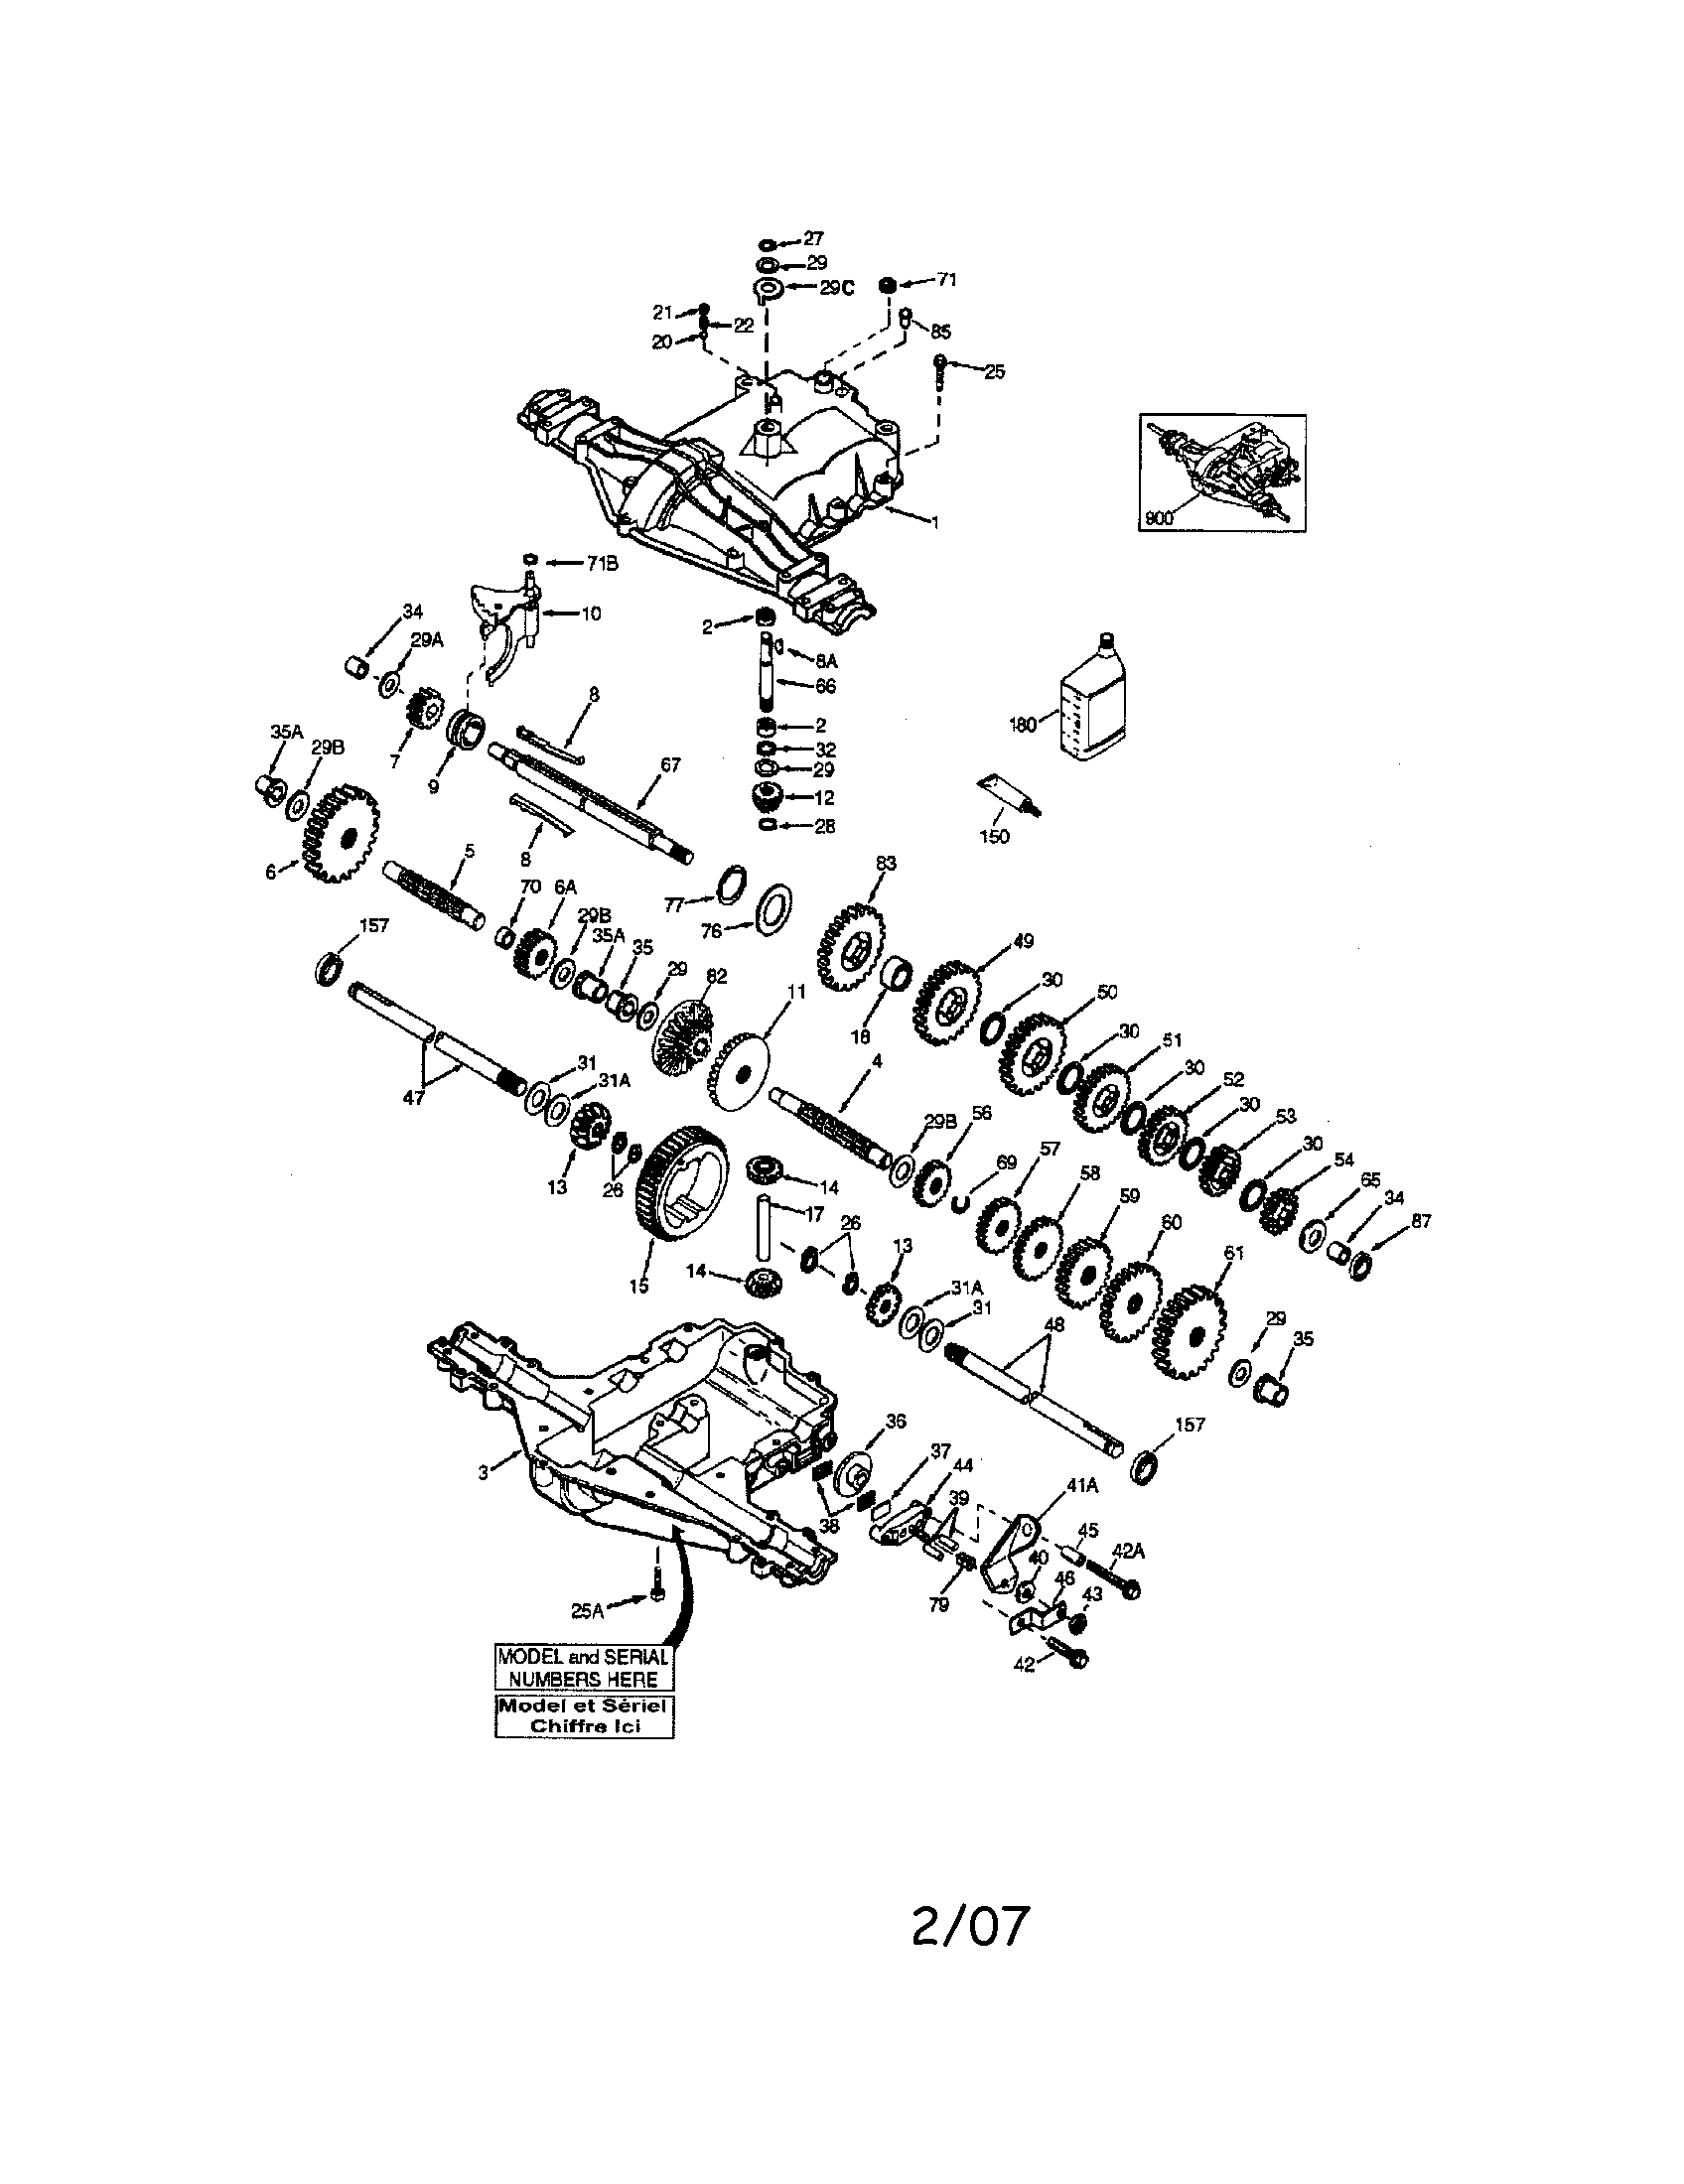 peerless transaxle diagram parts list for model 917270812 craftsman parts riding mower  [ 1696 x 2200 Pixel ]